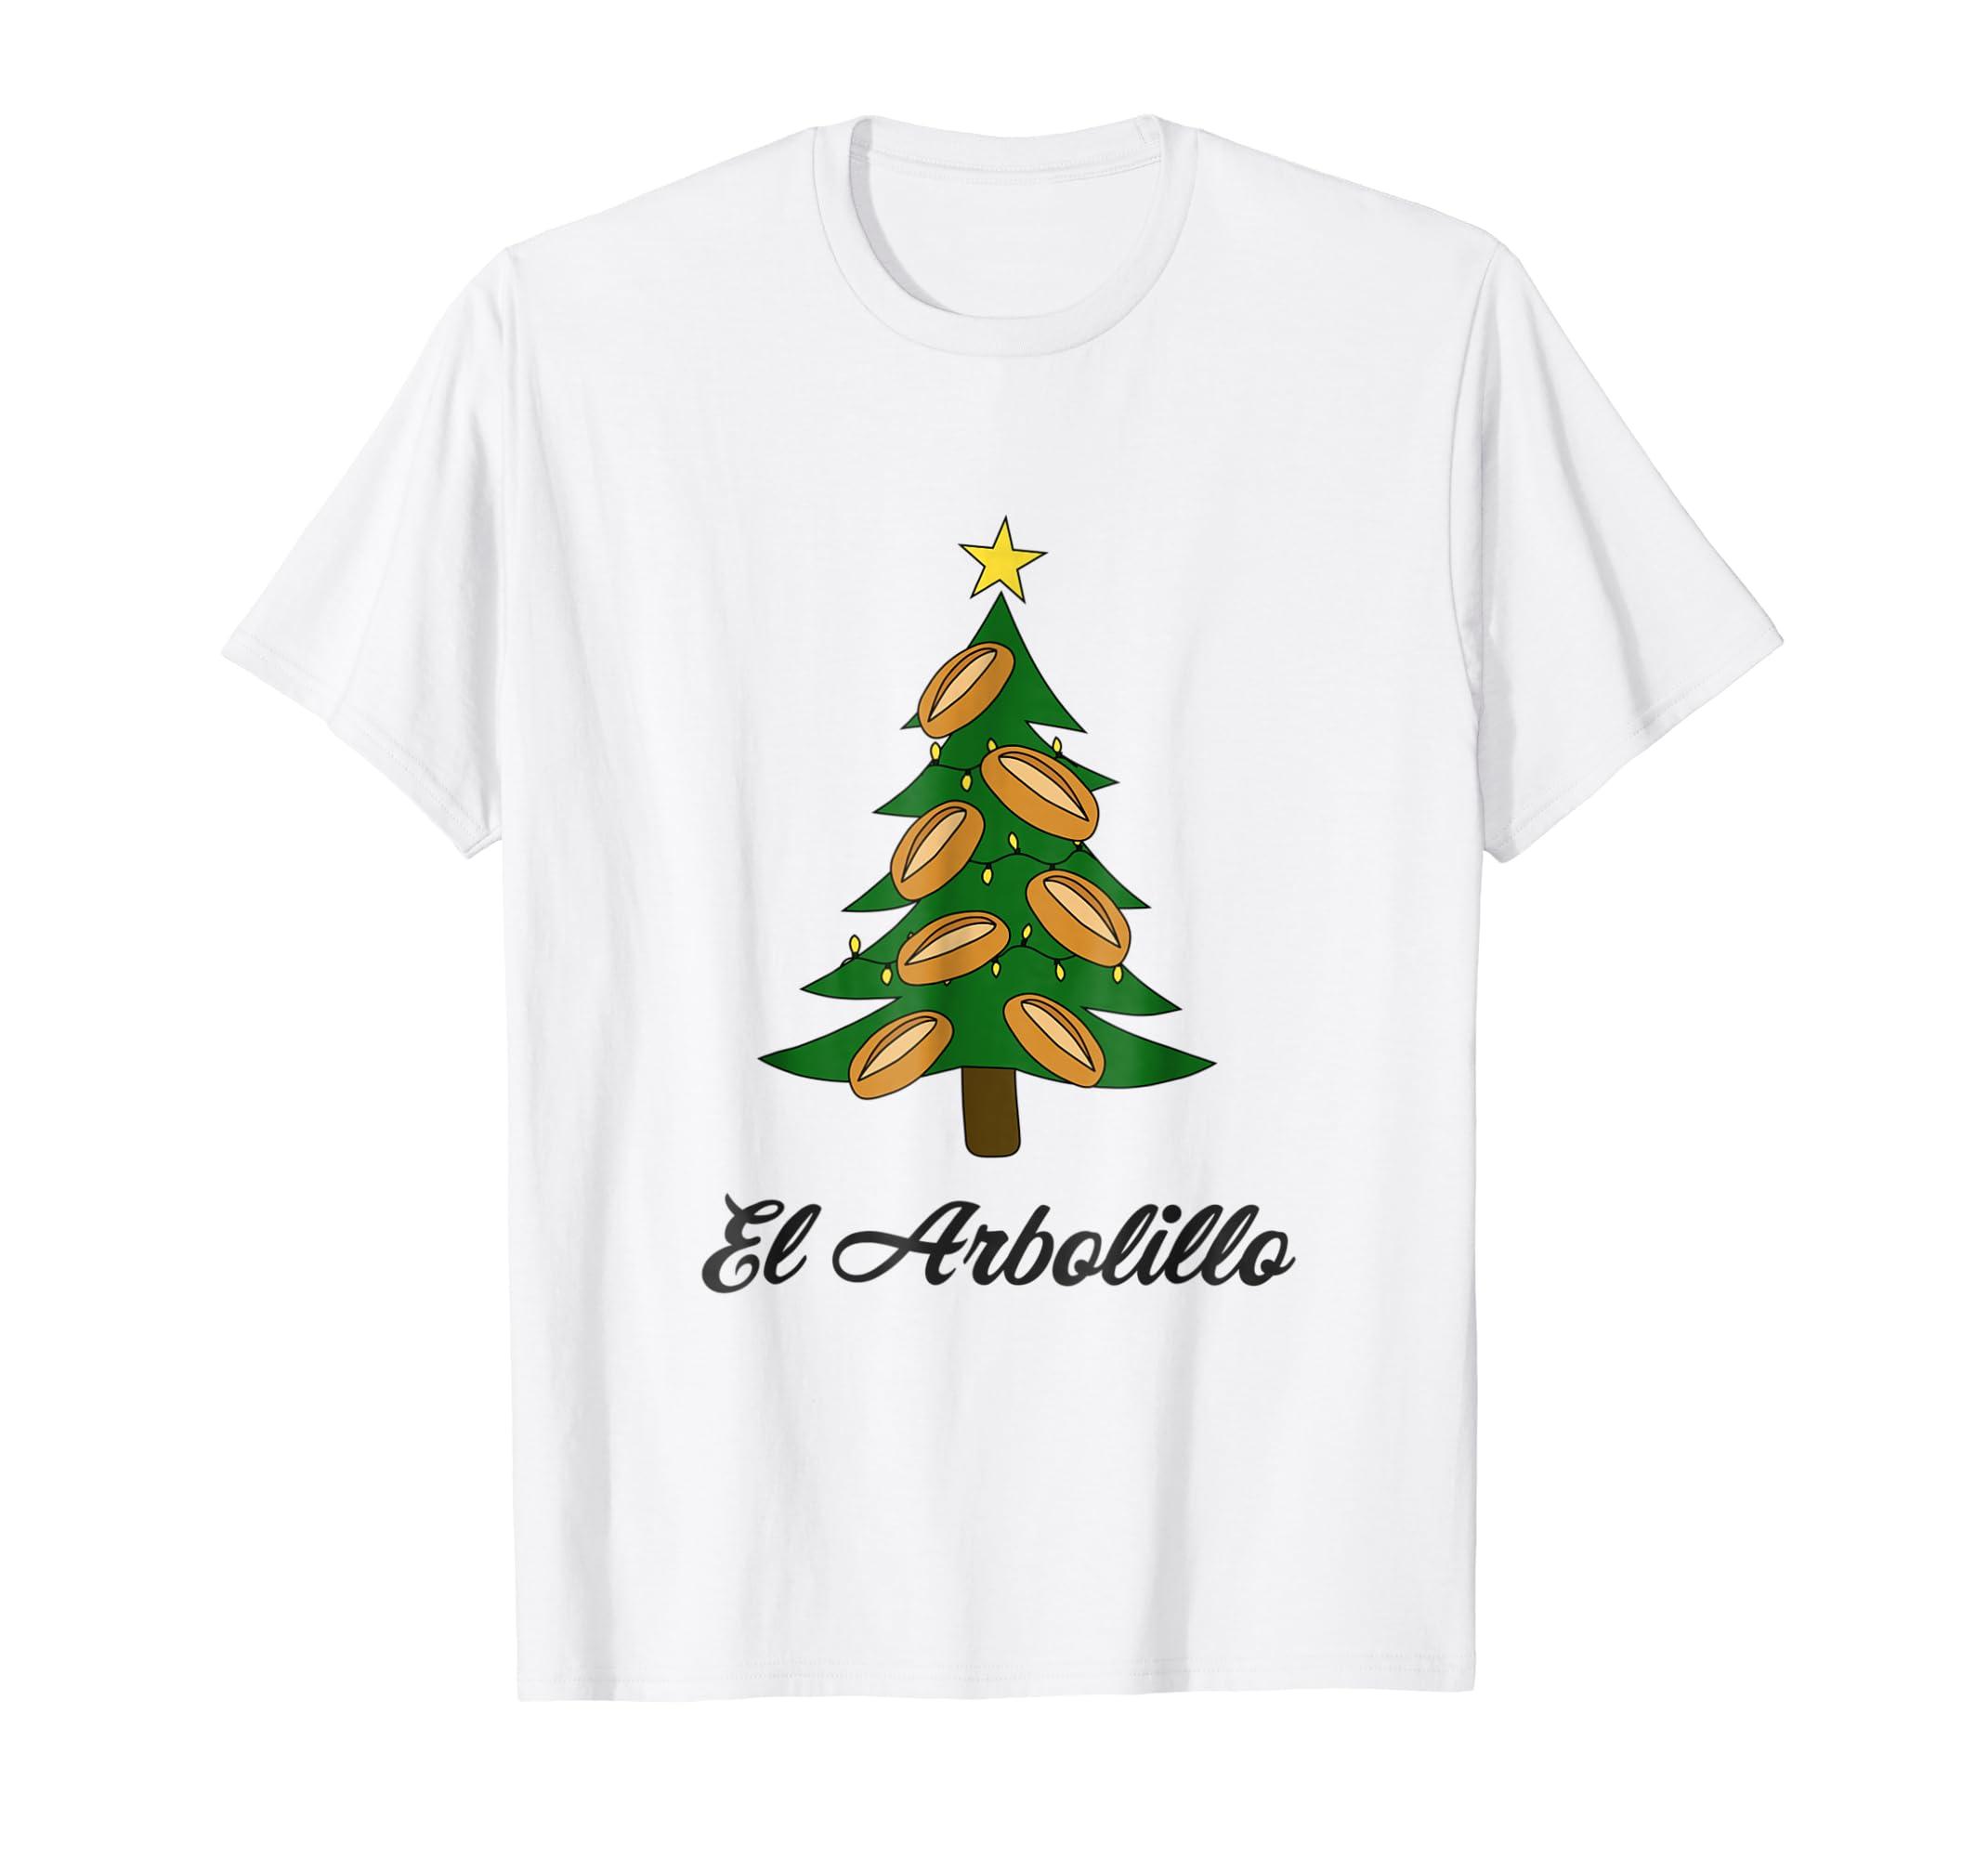 Amazon.com: Funny Bolillo Christmas Tree Arbolillo TShirt - Navidad 2018: Clothing